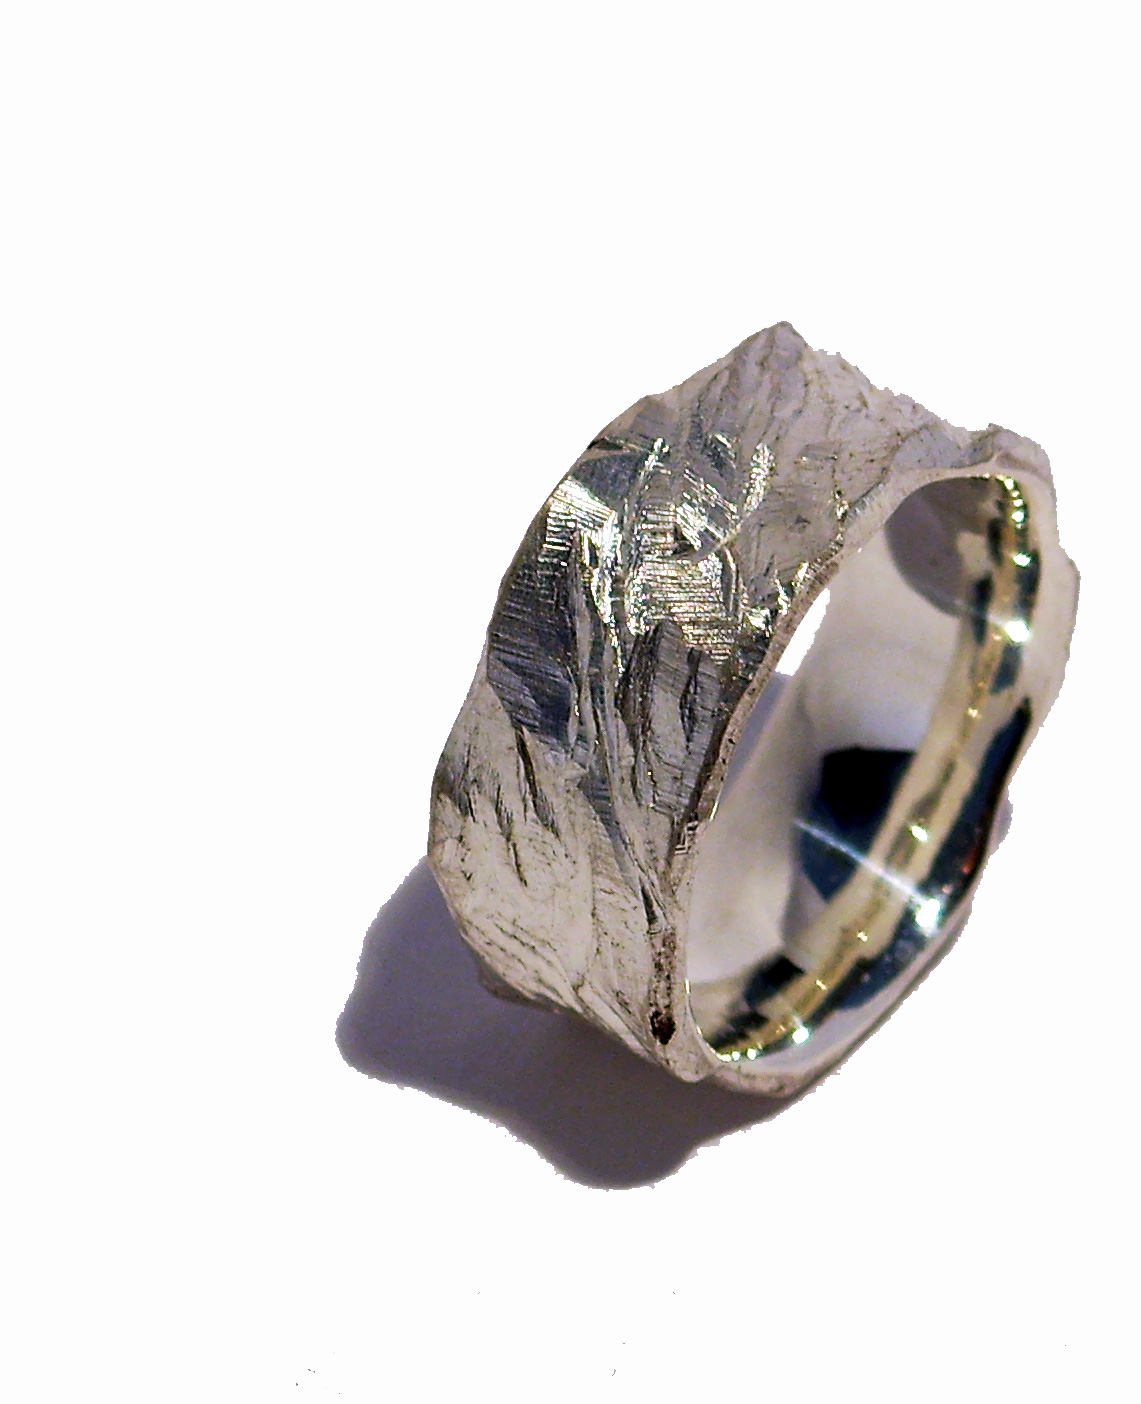 Strukturring, Silber, Ring, Struktur, Goldschmied, Basel, Spalenberg, Schmuck